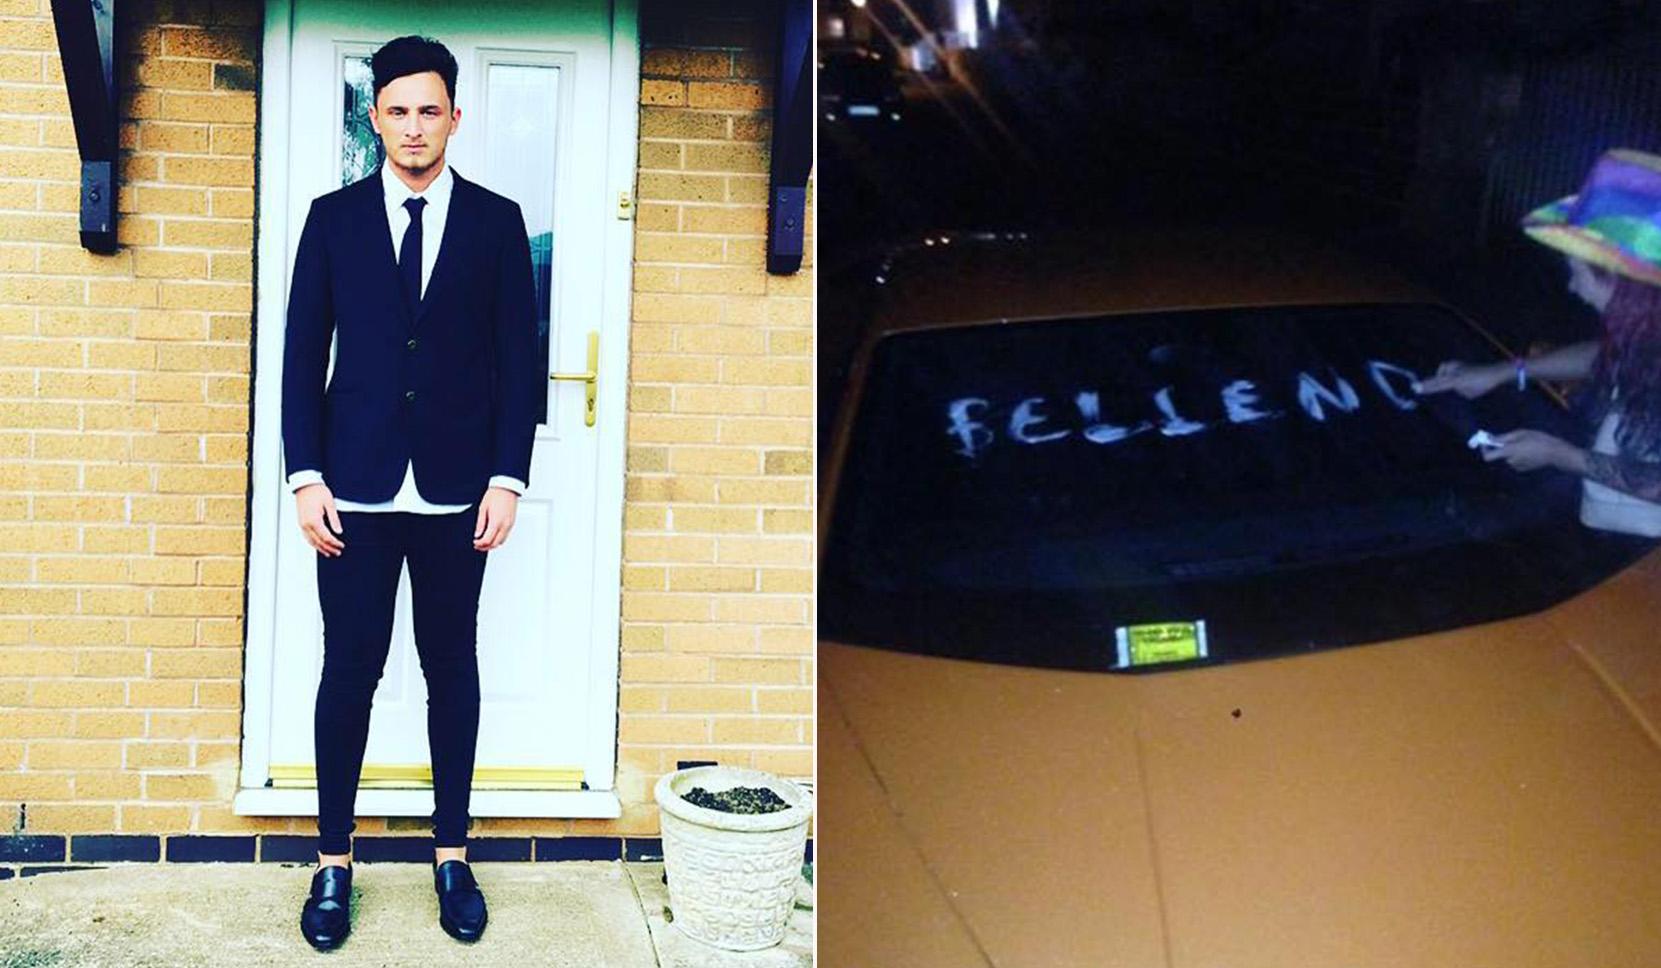 Lamborghini driver's revenge after someone wrote 'bellend' on his car